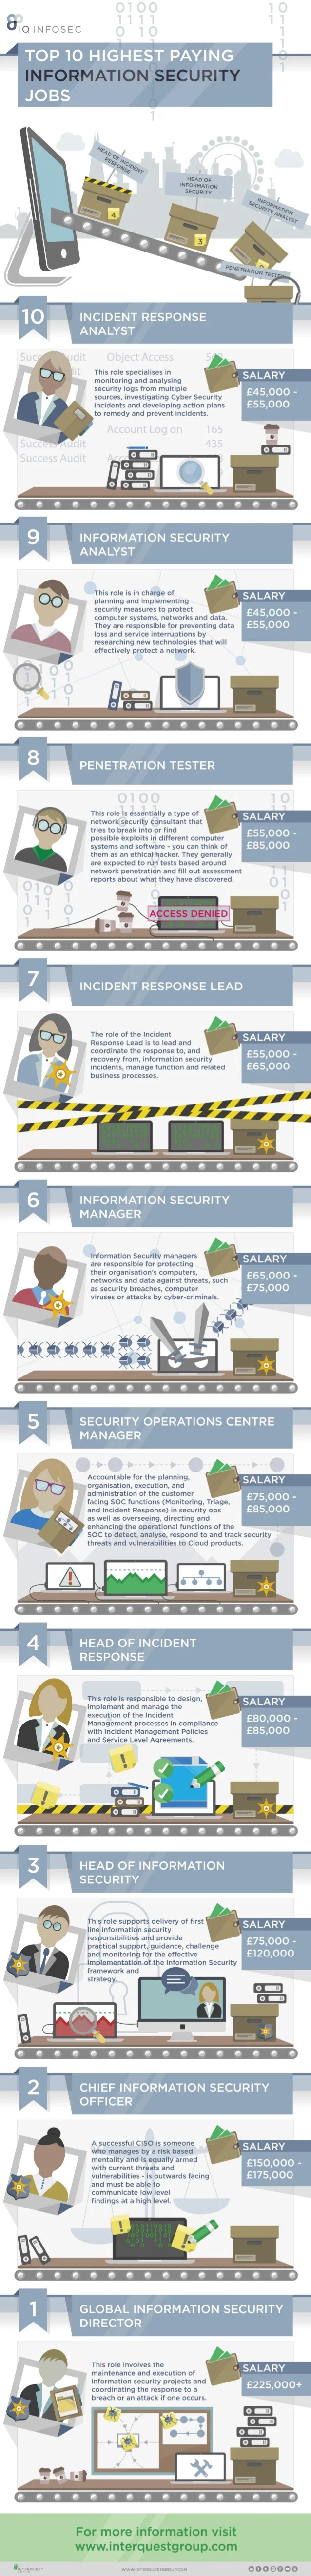 Top Security Careers